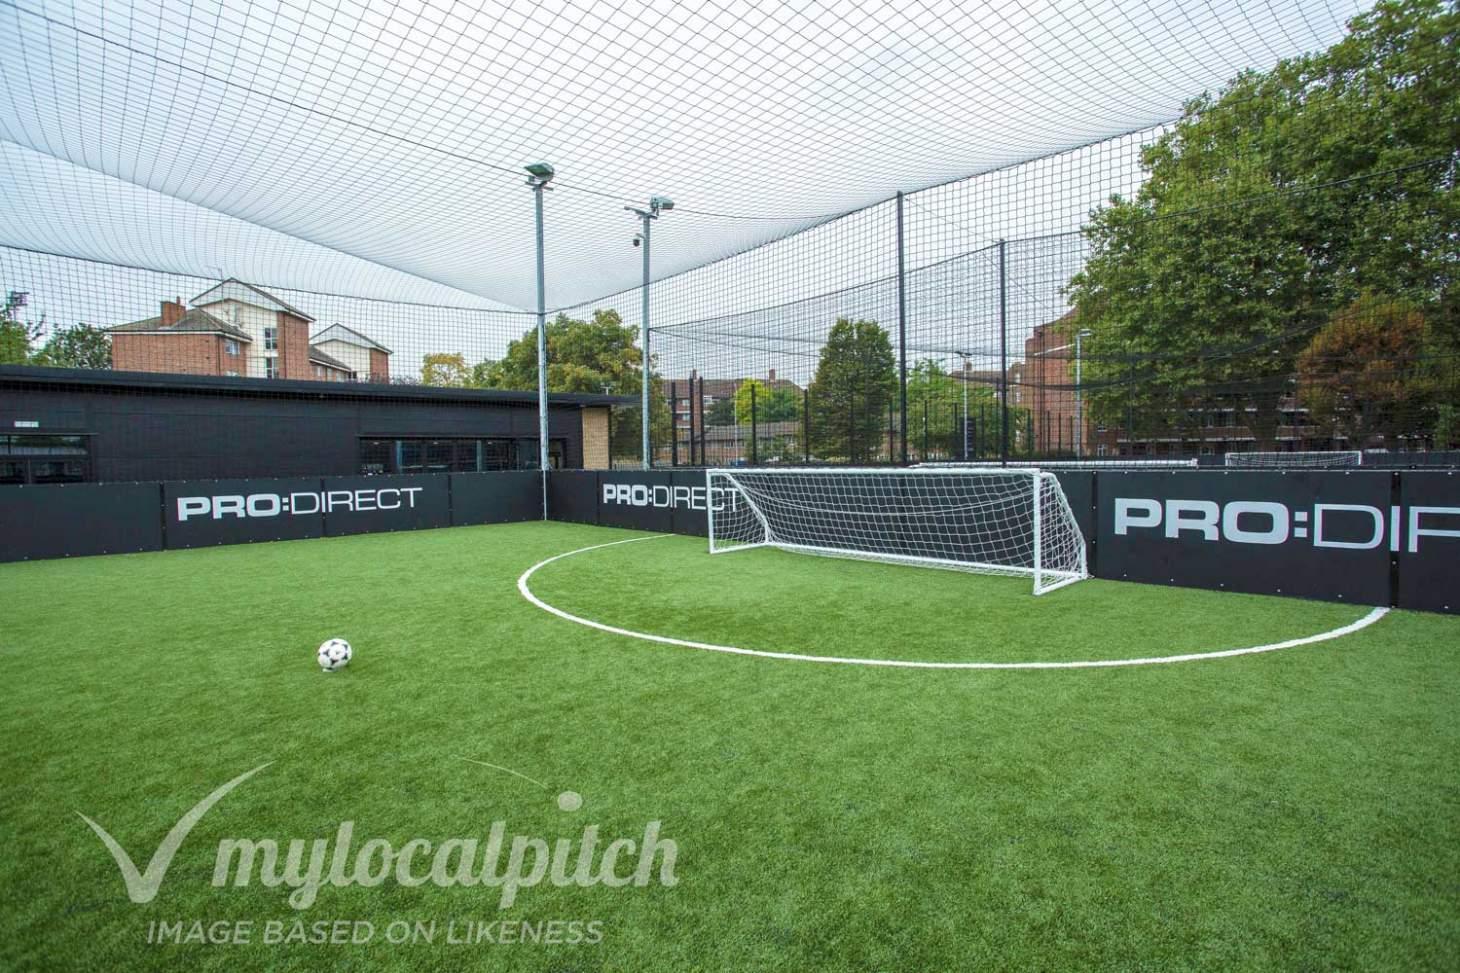 PlayFootball Preston 5 a side | 3G Astroturf football pitch